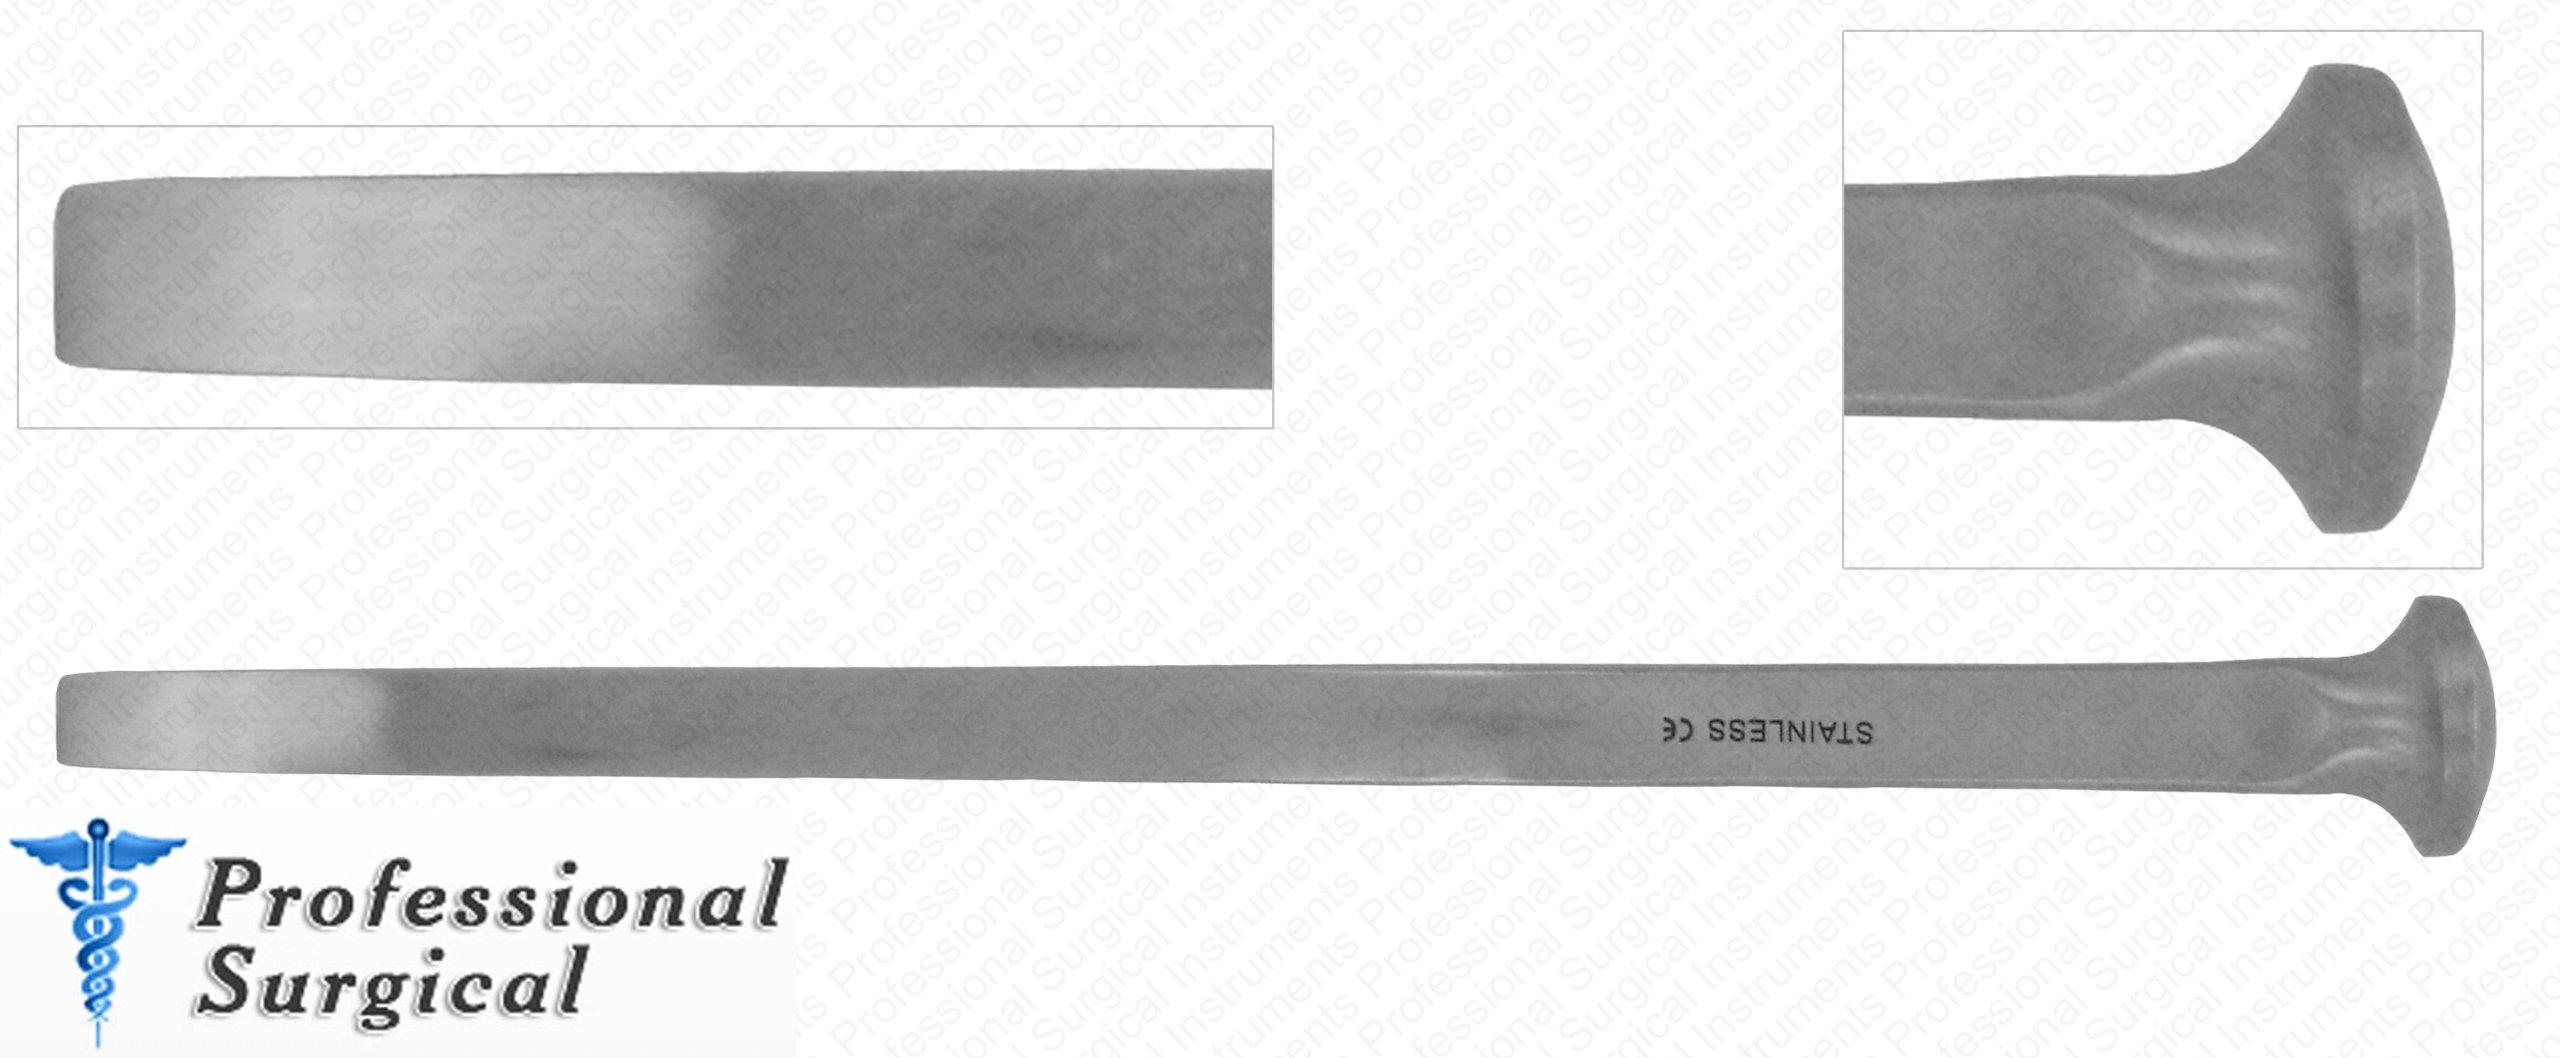 U.s.army Osteotome 6mm Wide